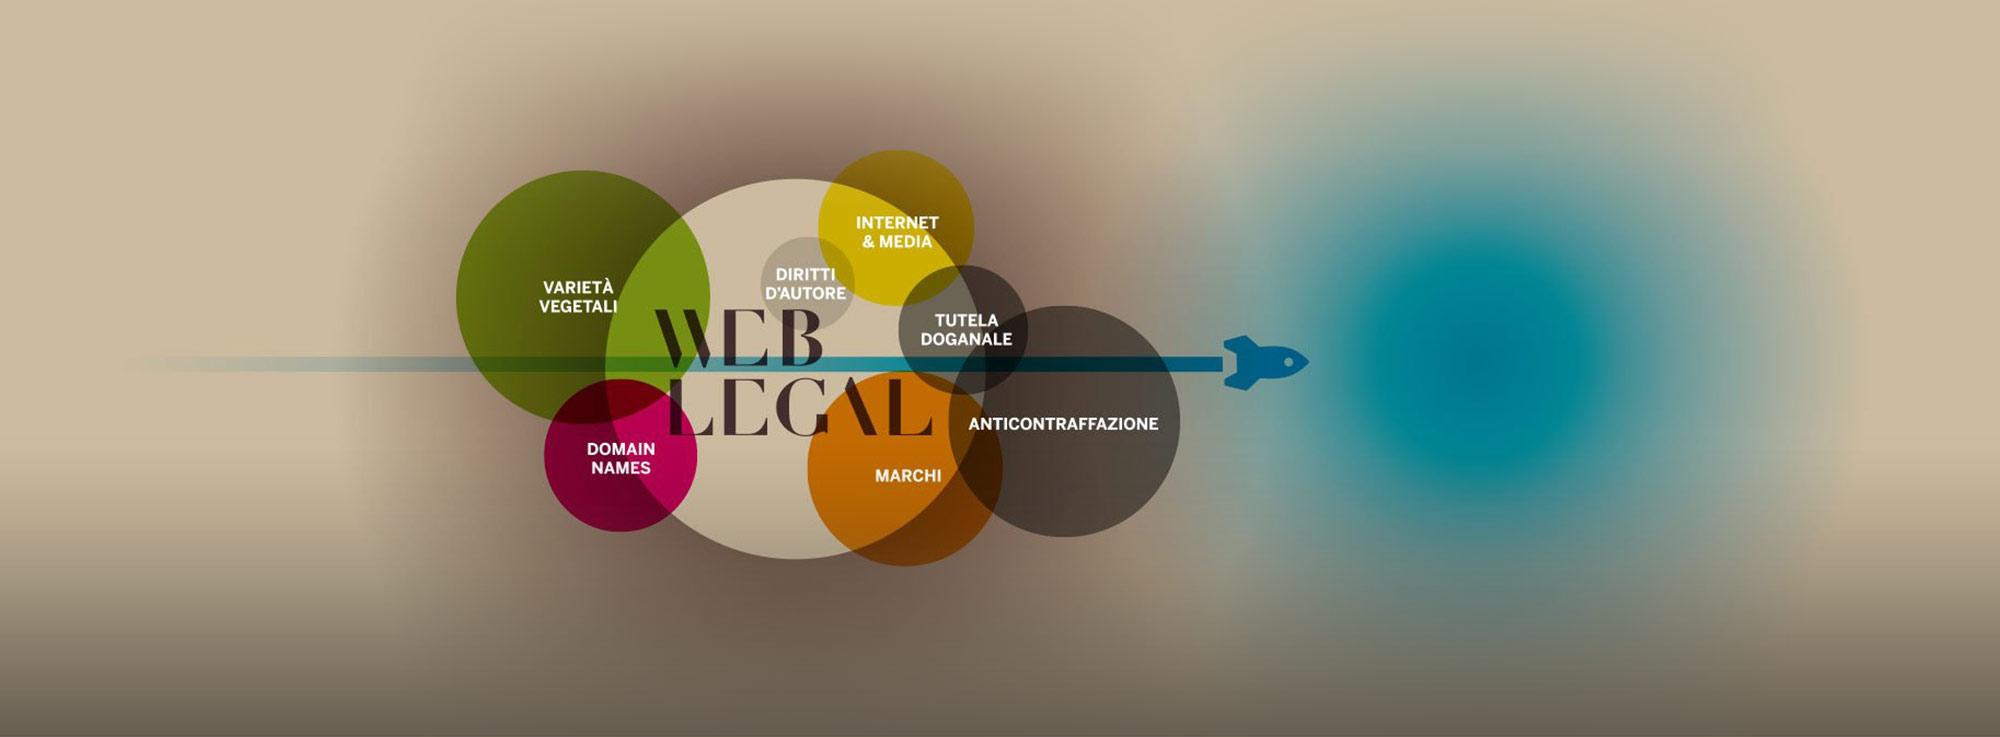 WebLegal Barletta